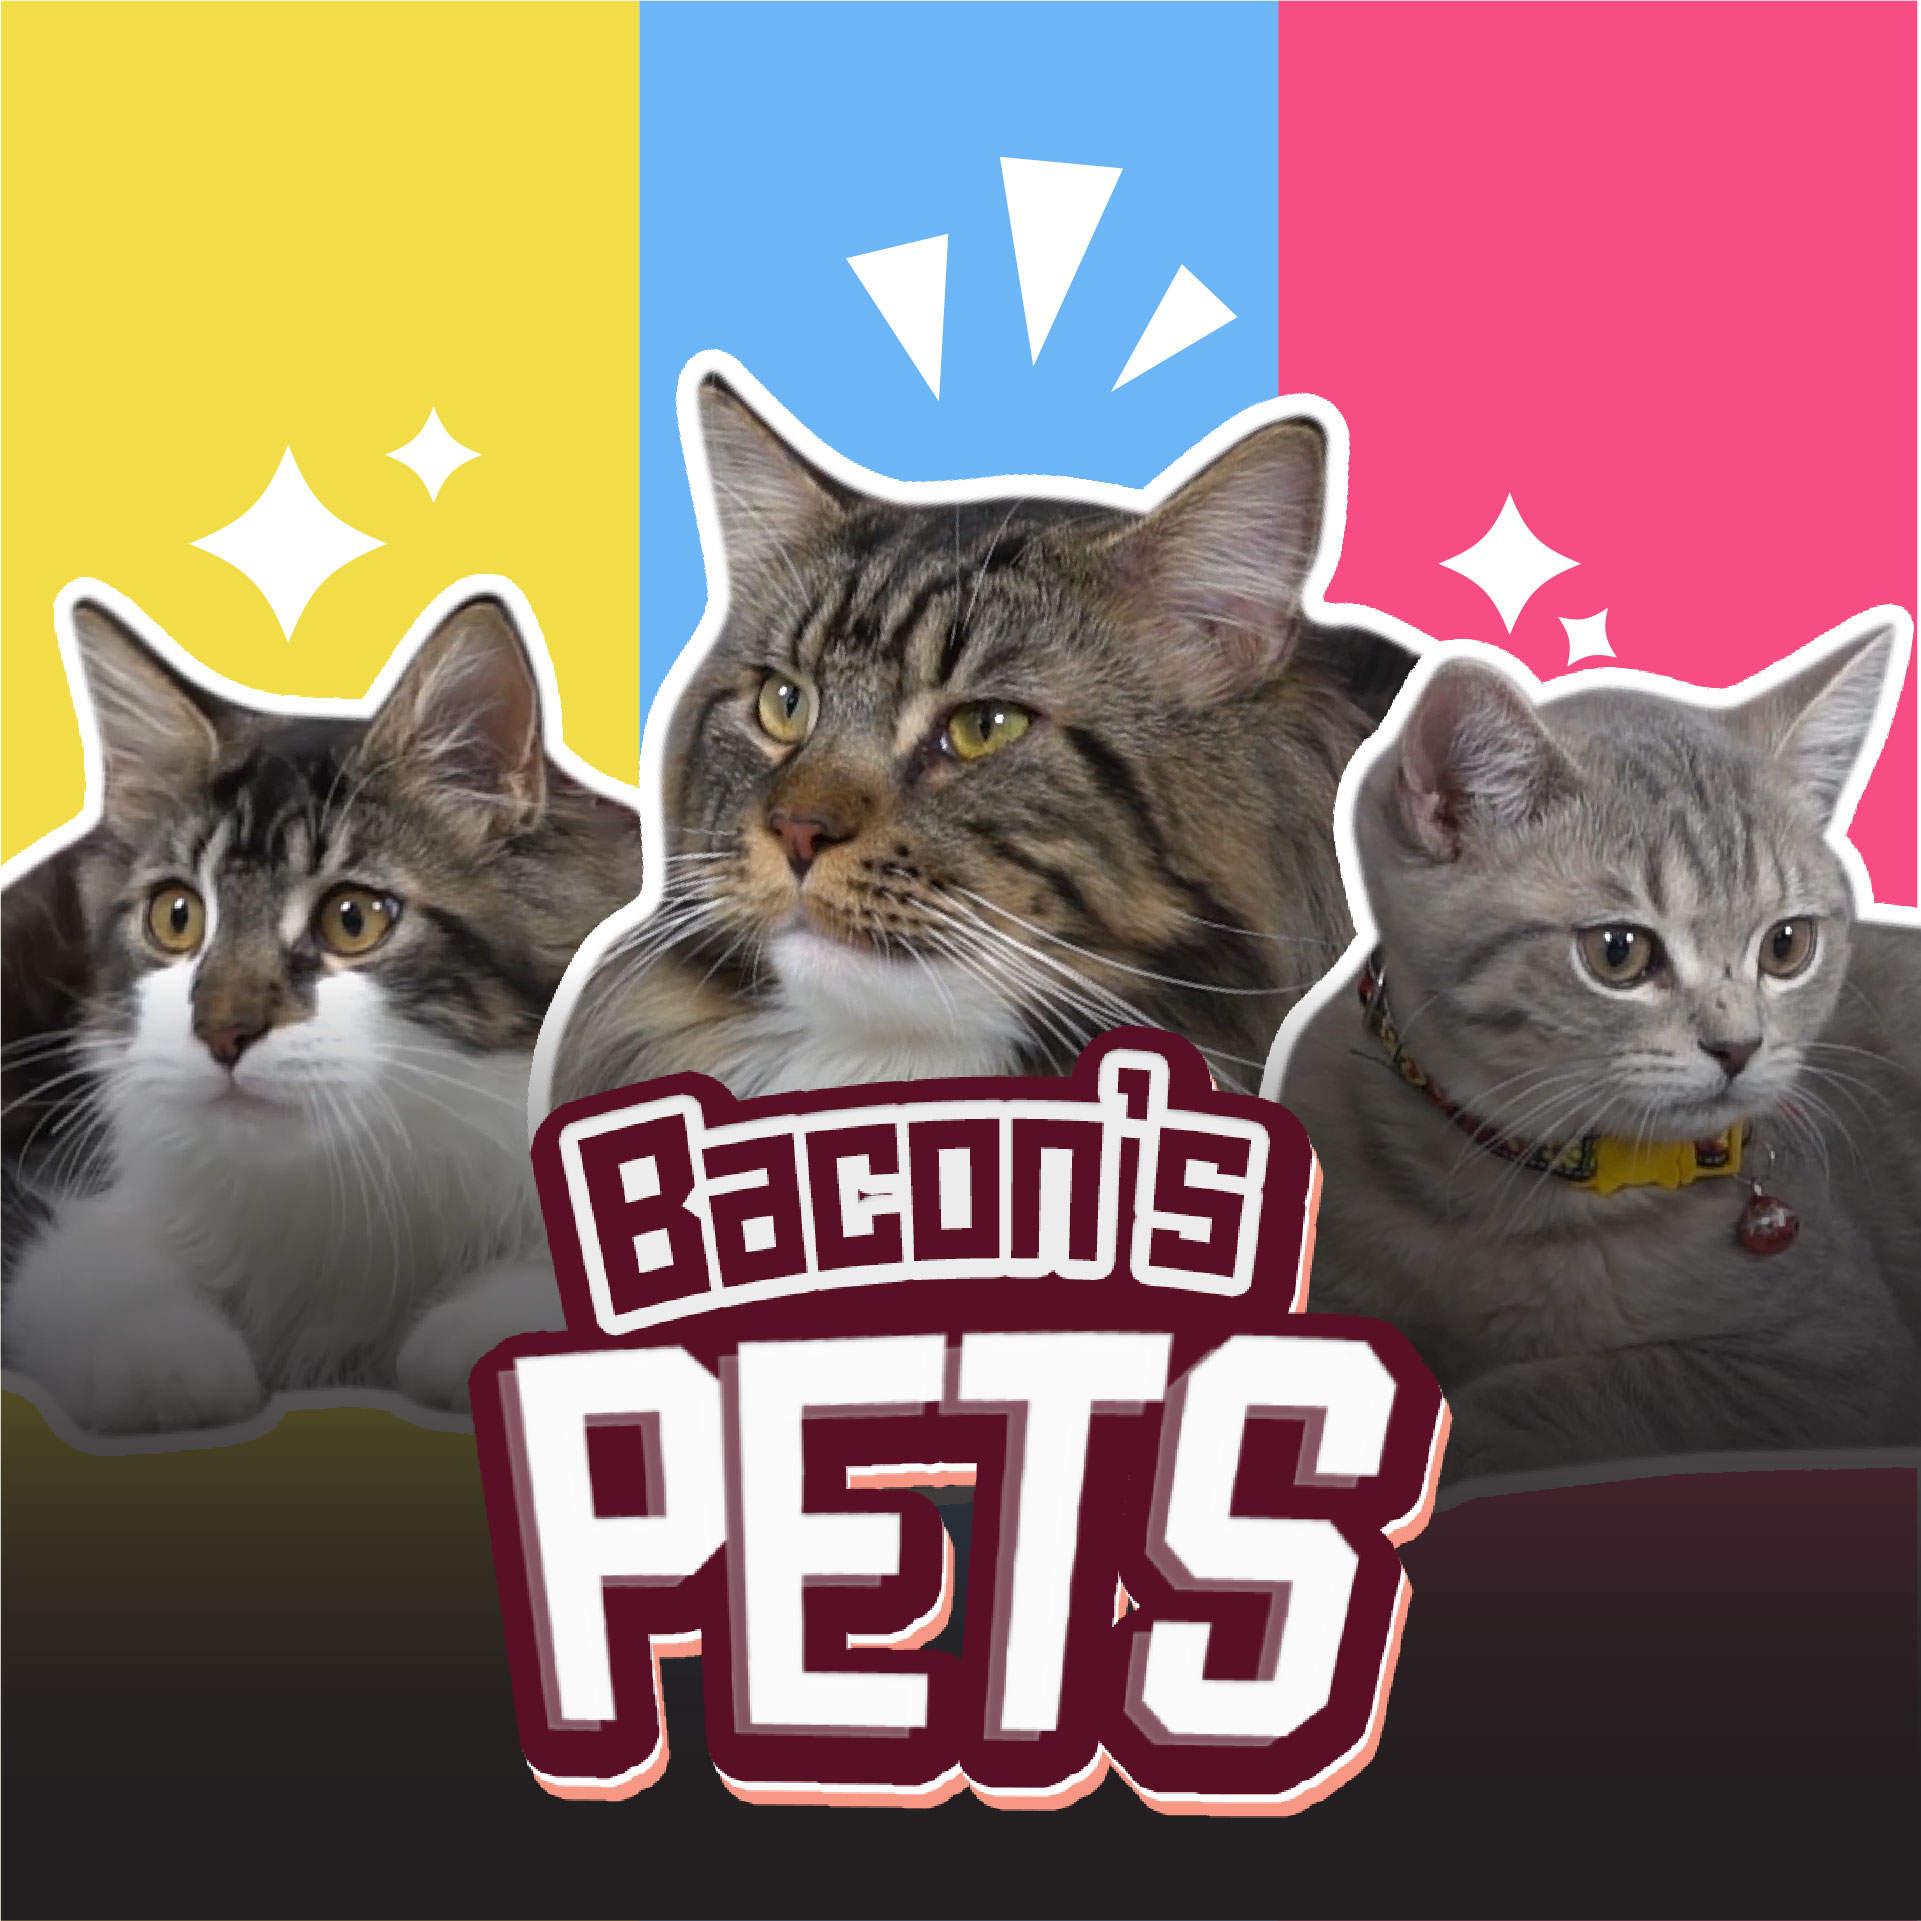 Bacon's Pet